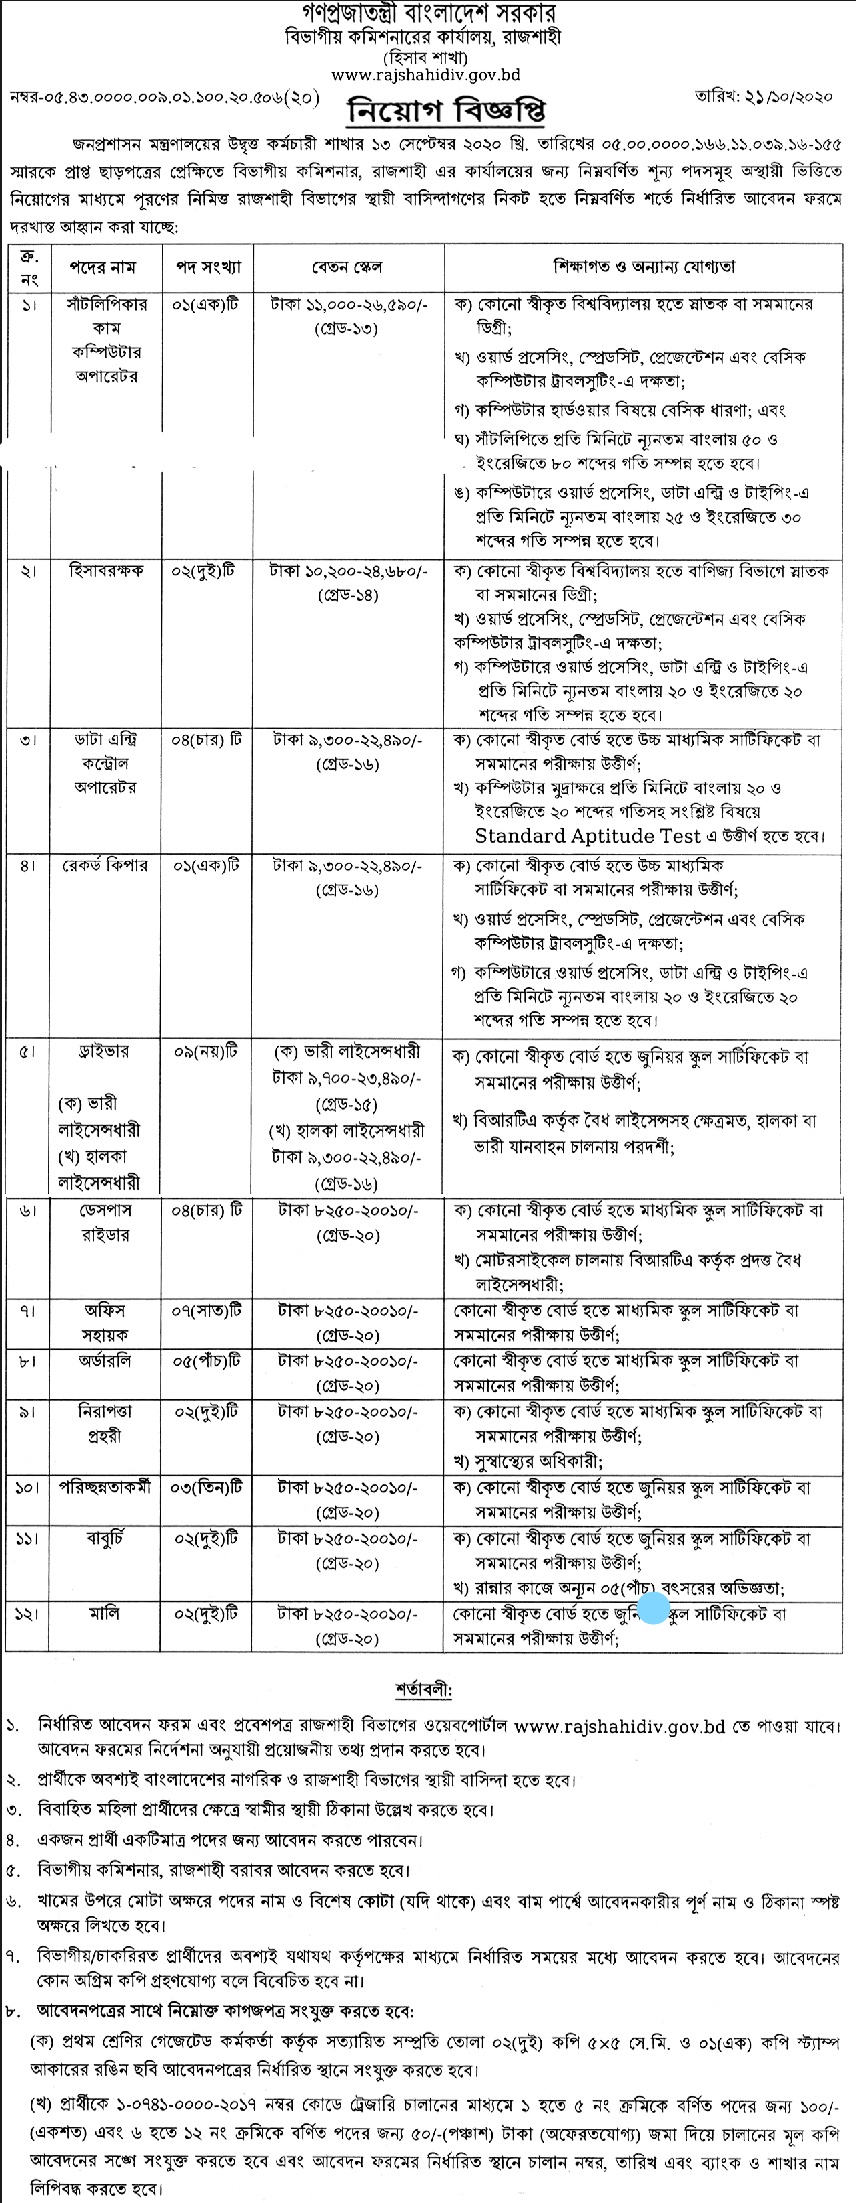 Divisional Commissioner Office Job Circular 2020